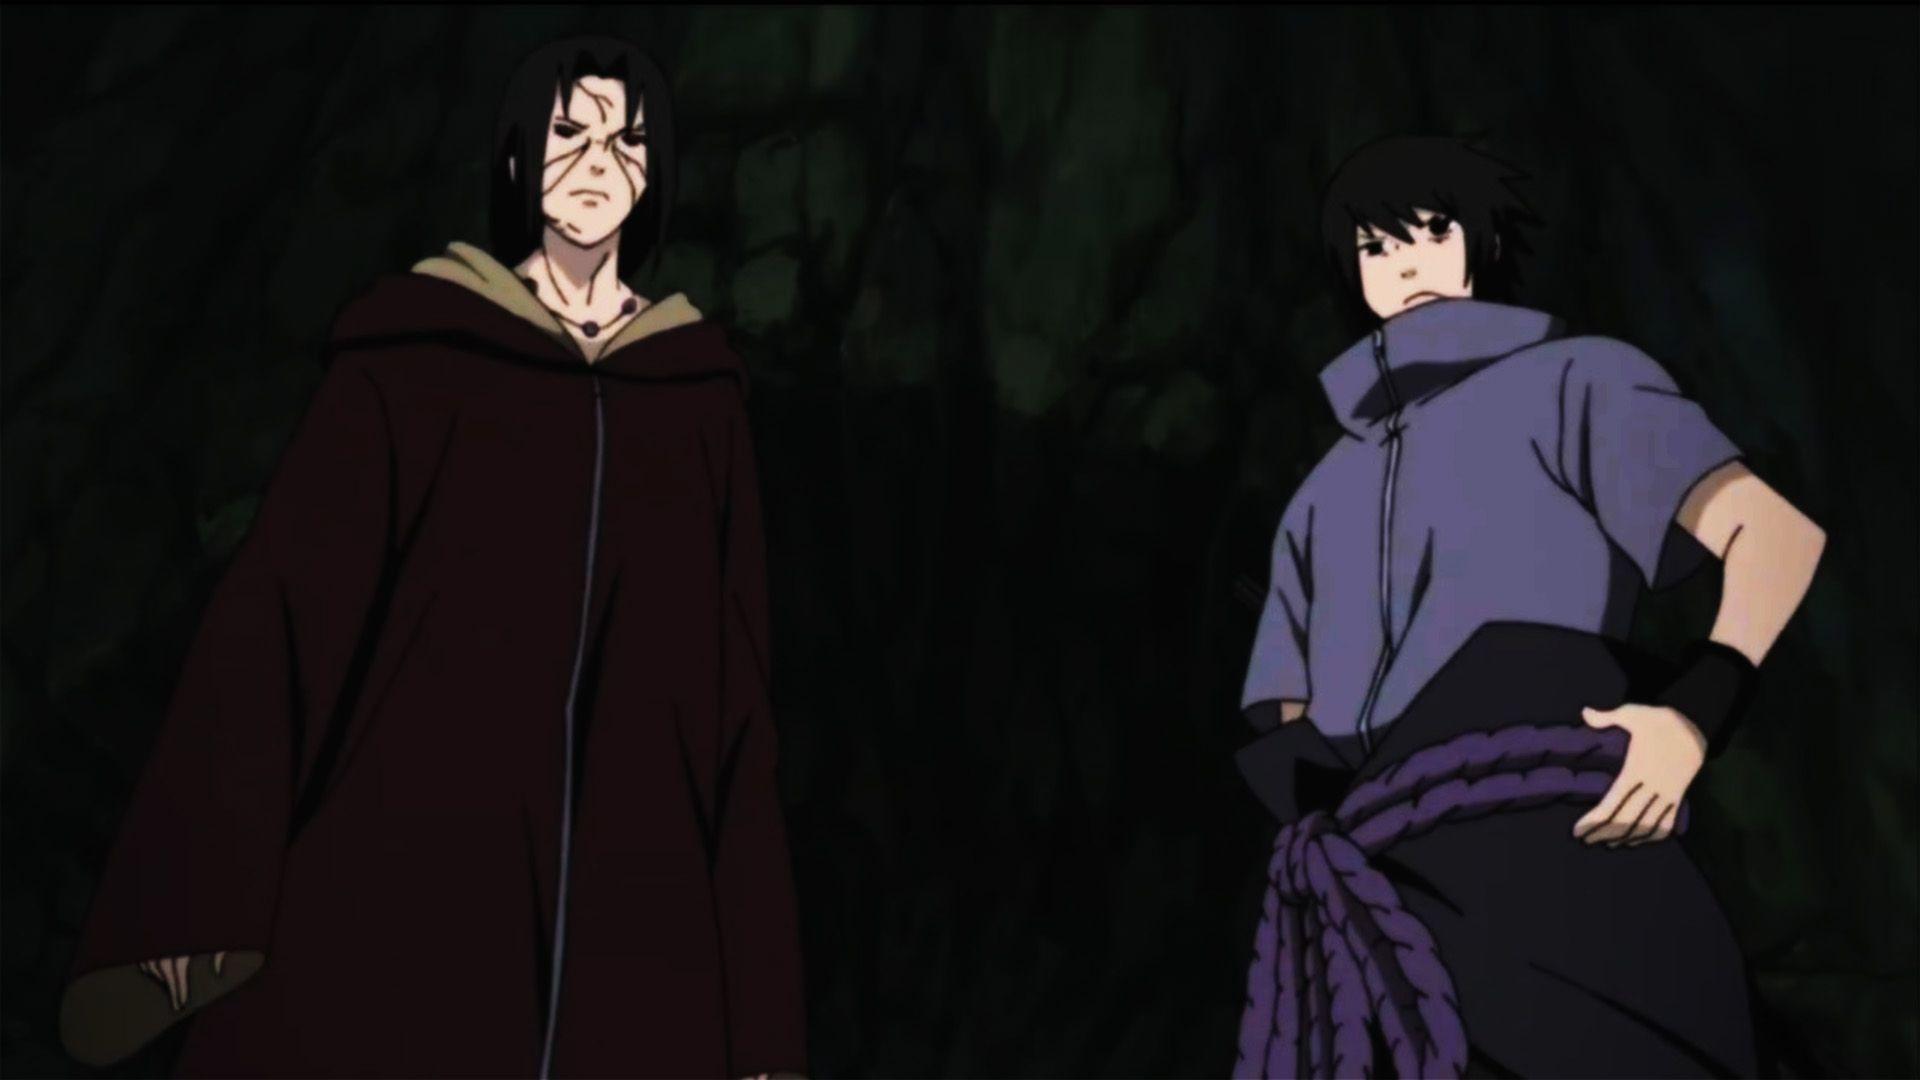 Itachi and Sasuke HD Wallpaper   Anime Wallpapers